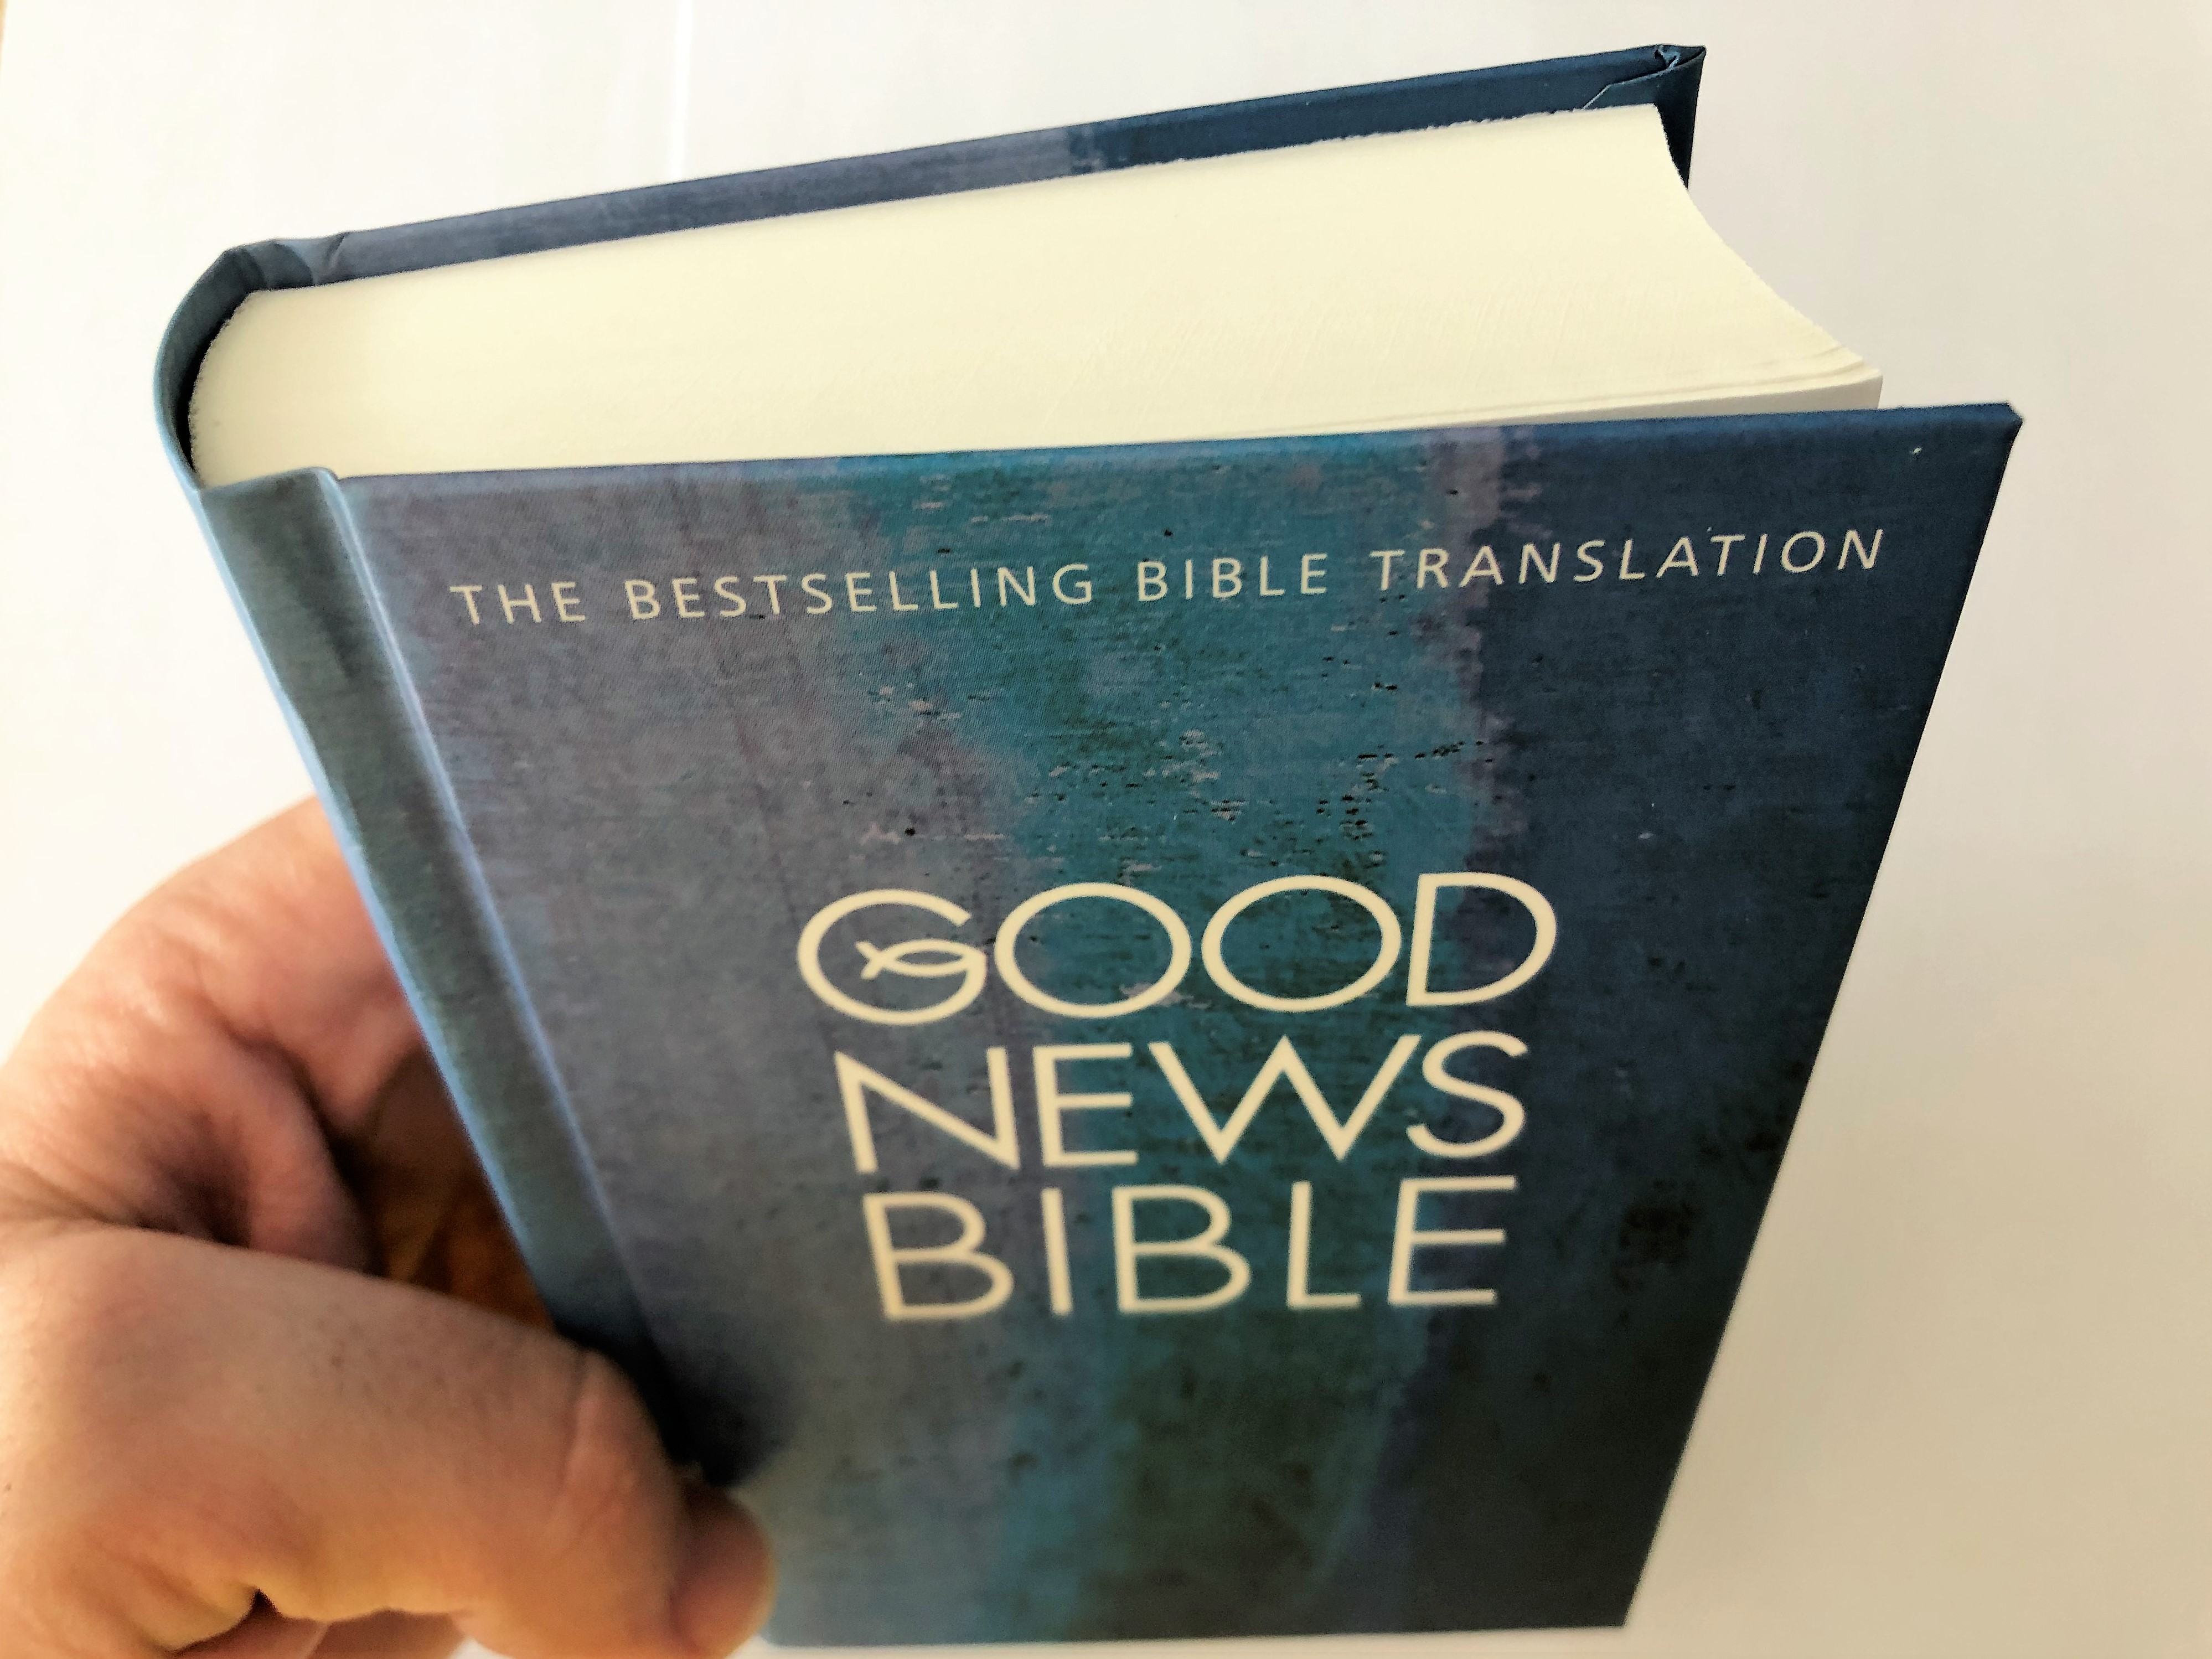 good-news-bible-2015-gnb-the-uk-s-bestselling-bible-translation-hardcover-pocket-edition-blue-15-.jpg